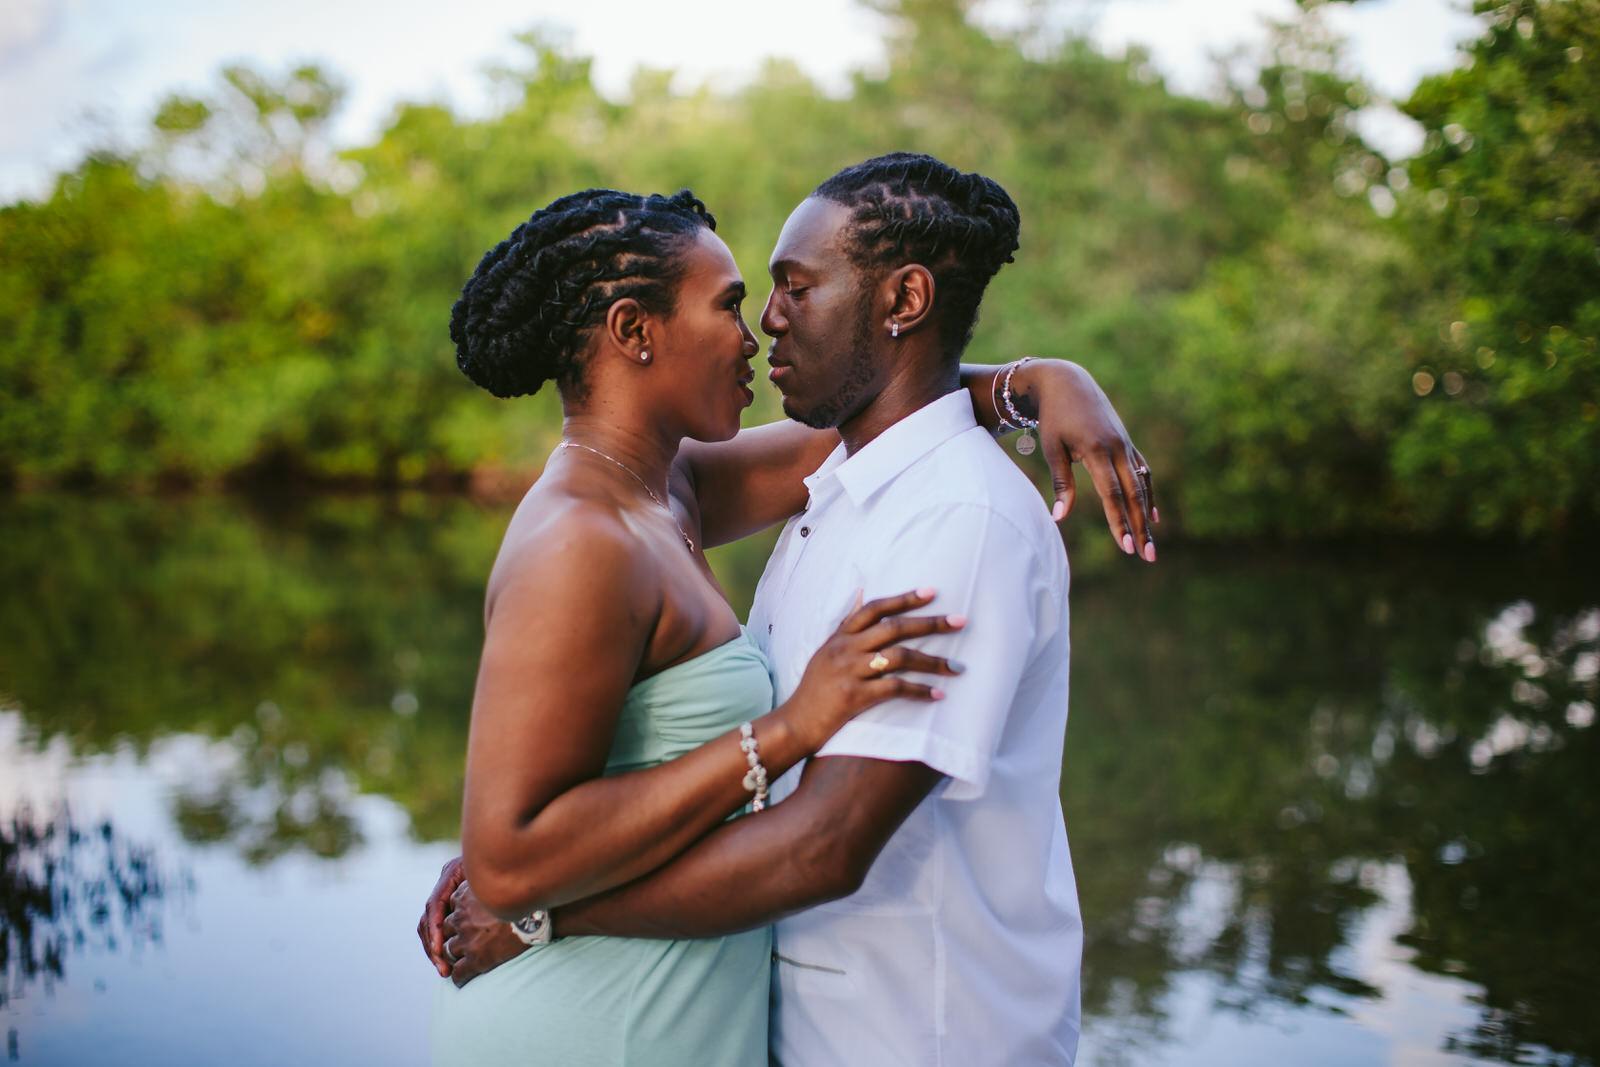 tropical-destination-engagement-portraits-tiny-house-photo-florida-wedding-photographer-13.jpg